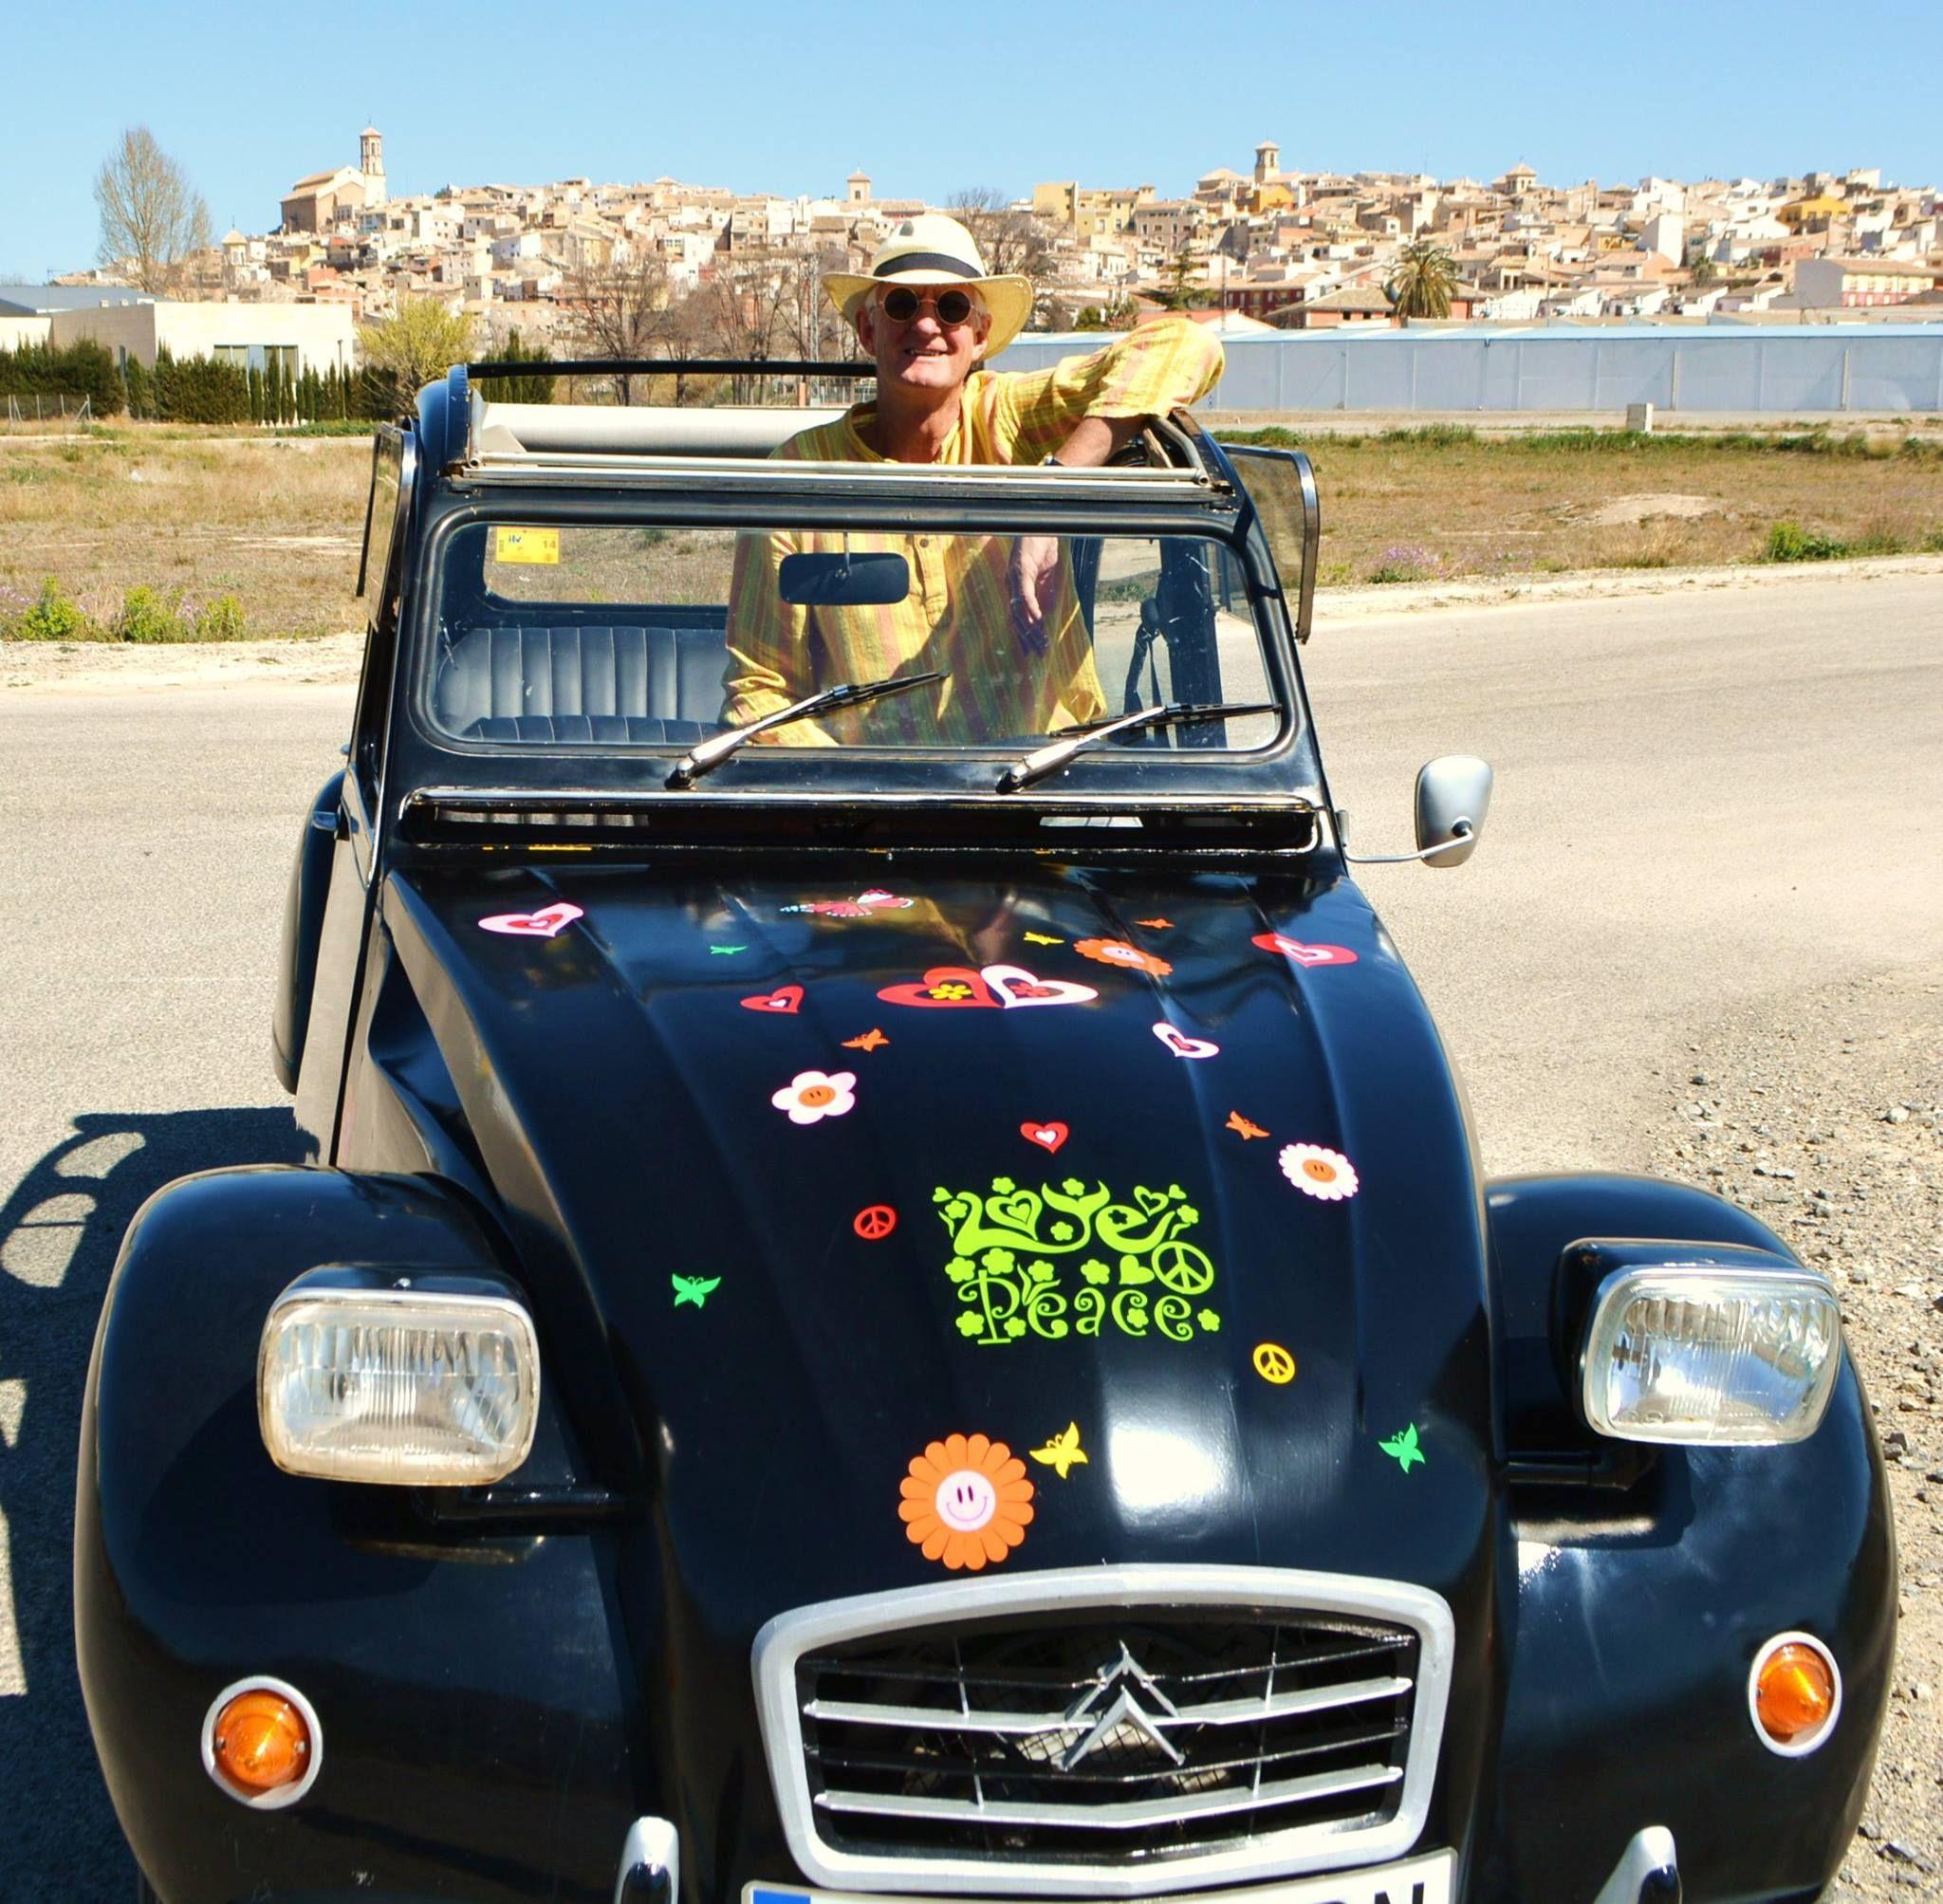 Love And Peace Vinyl Car Camper Van Stickers By Hippy Motors Http - Custom vinyl car stickers uk